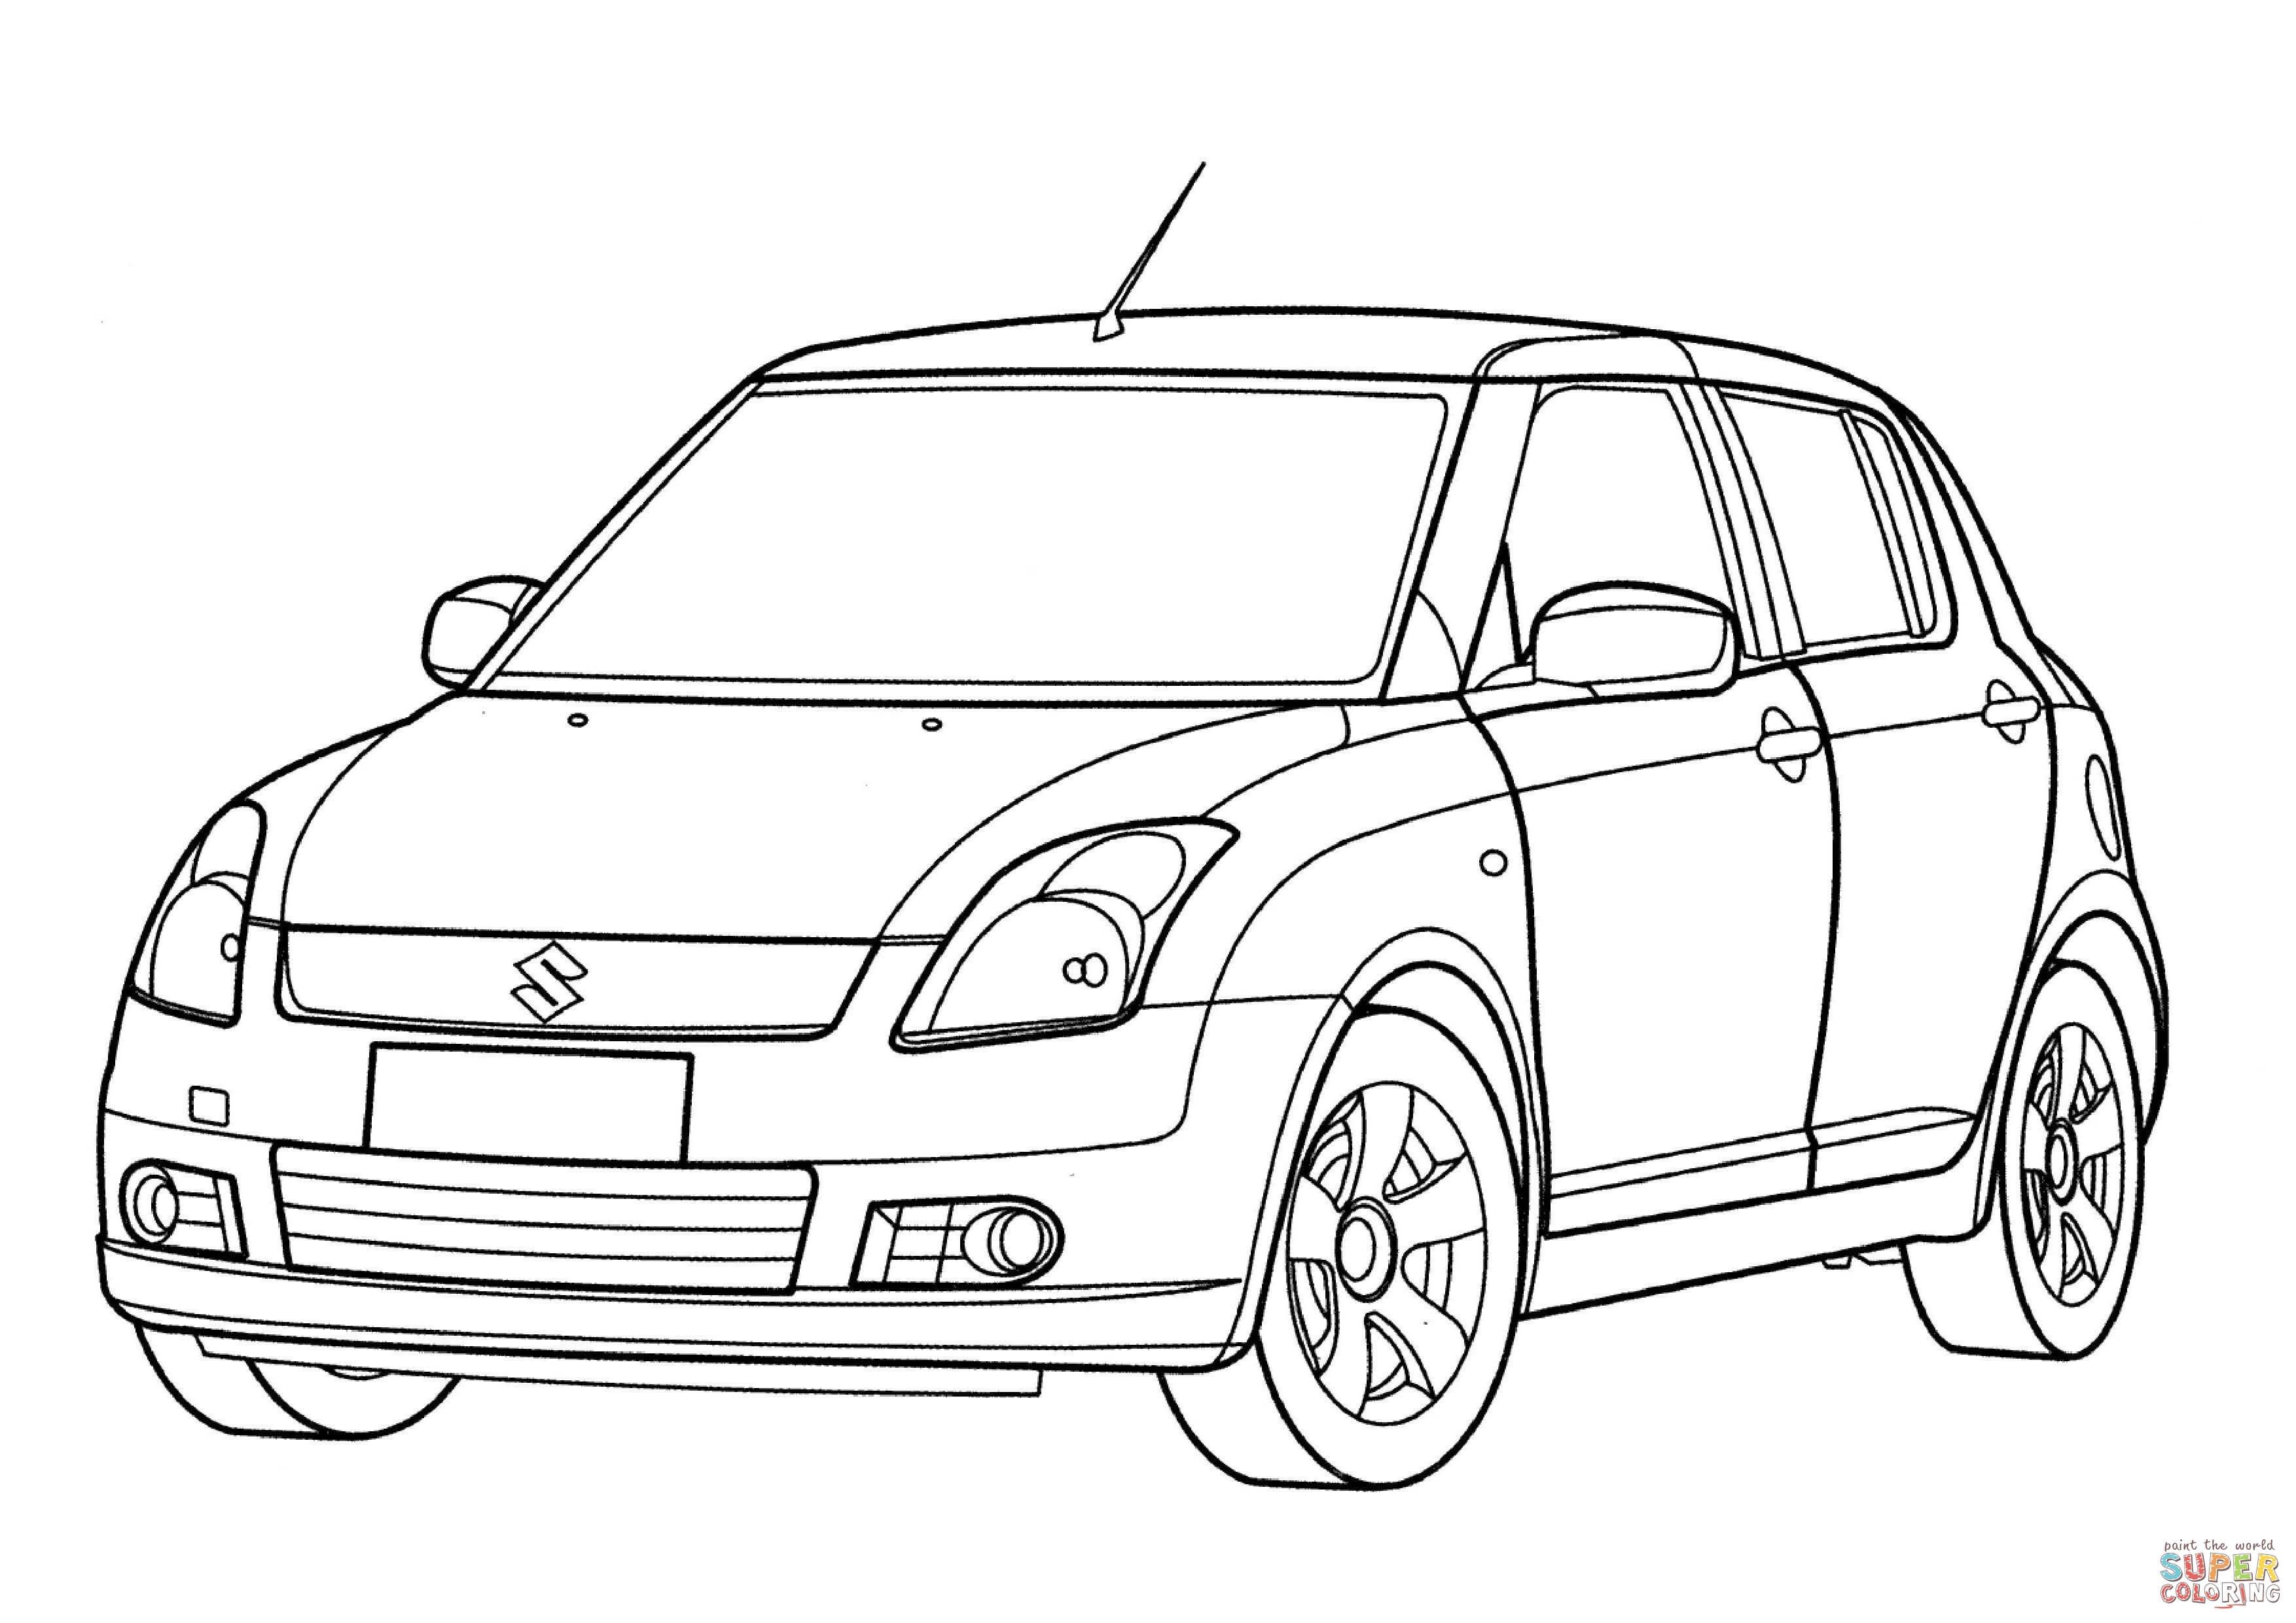 Suzuki Swift Coloring Page